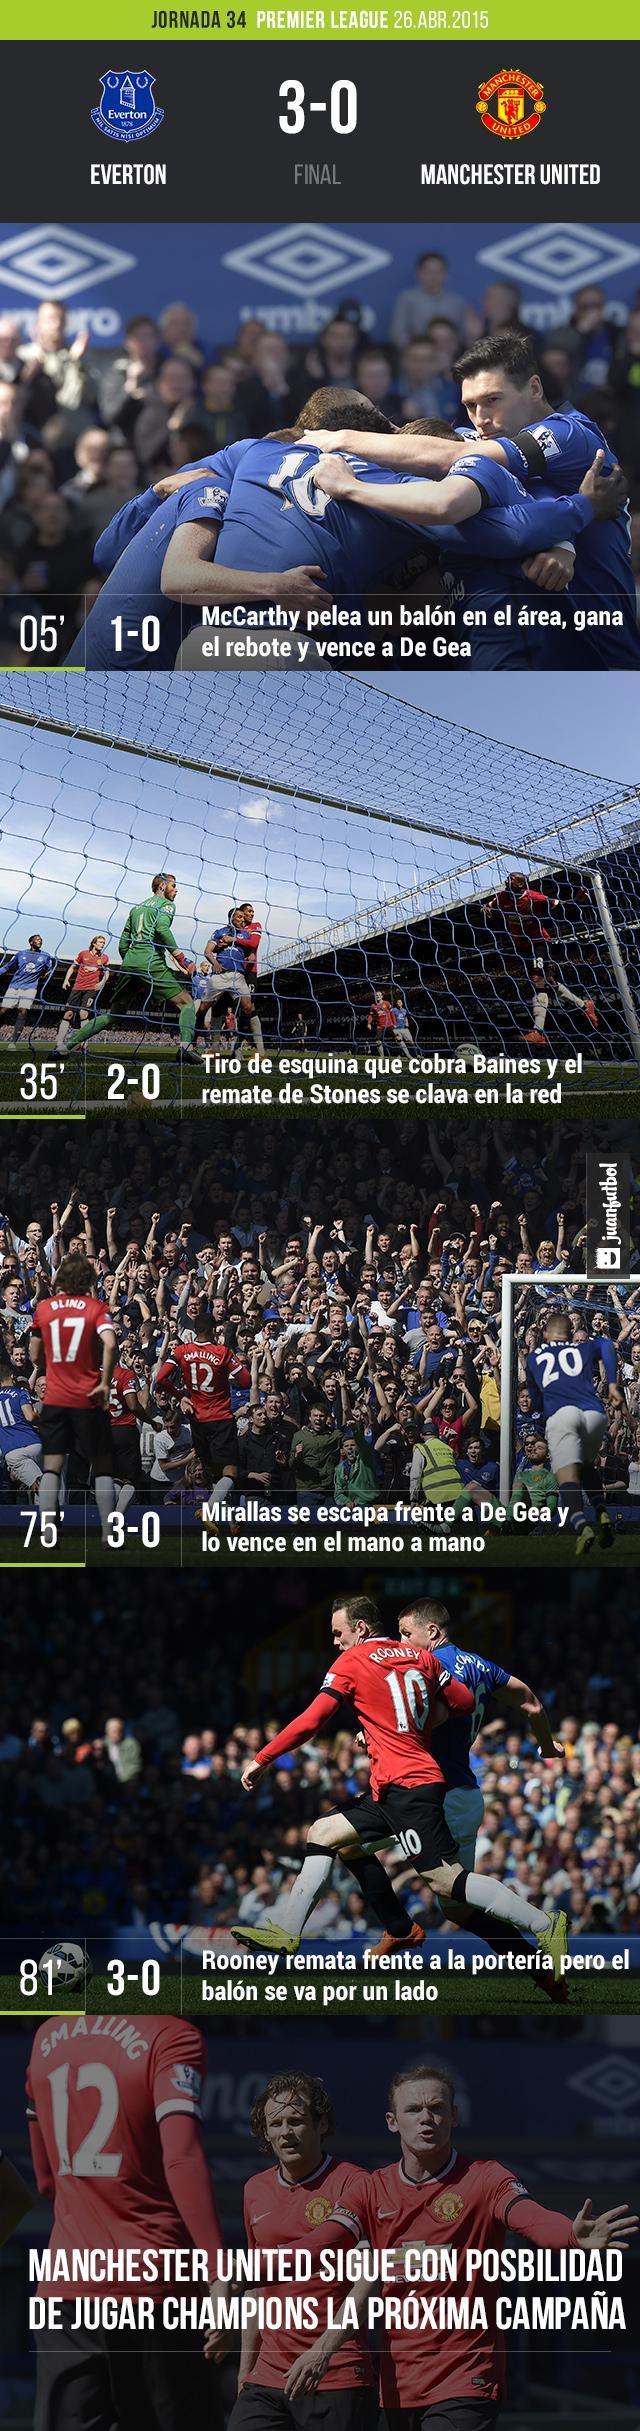 Everton venció al Manchester United en Goodison Park 3-0.